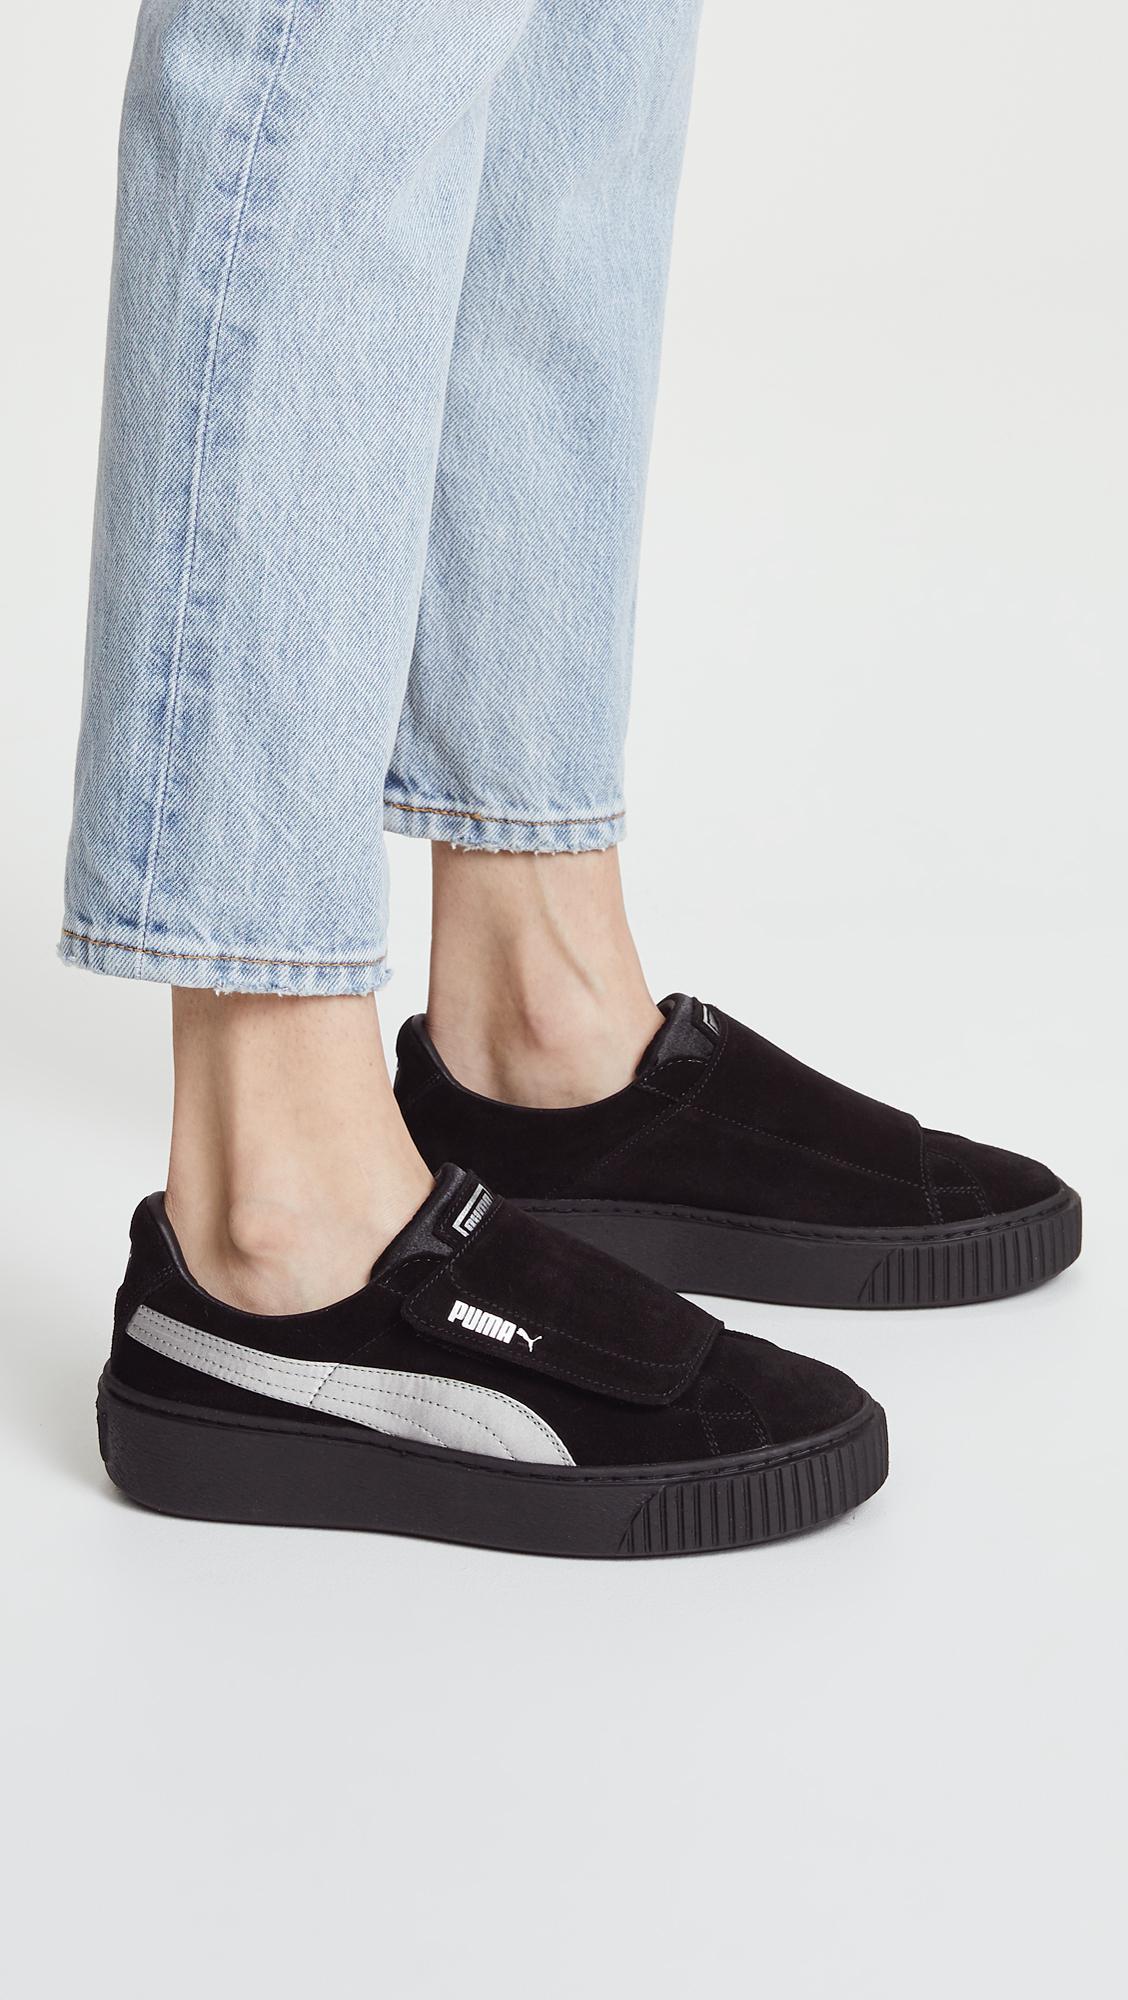 9ba2a396c05a PUMA Platform Strap Satin Ep Sneakers in Black - Lyst